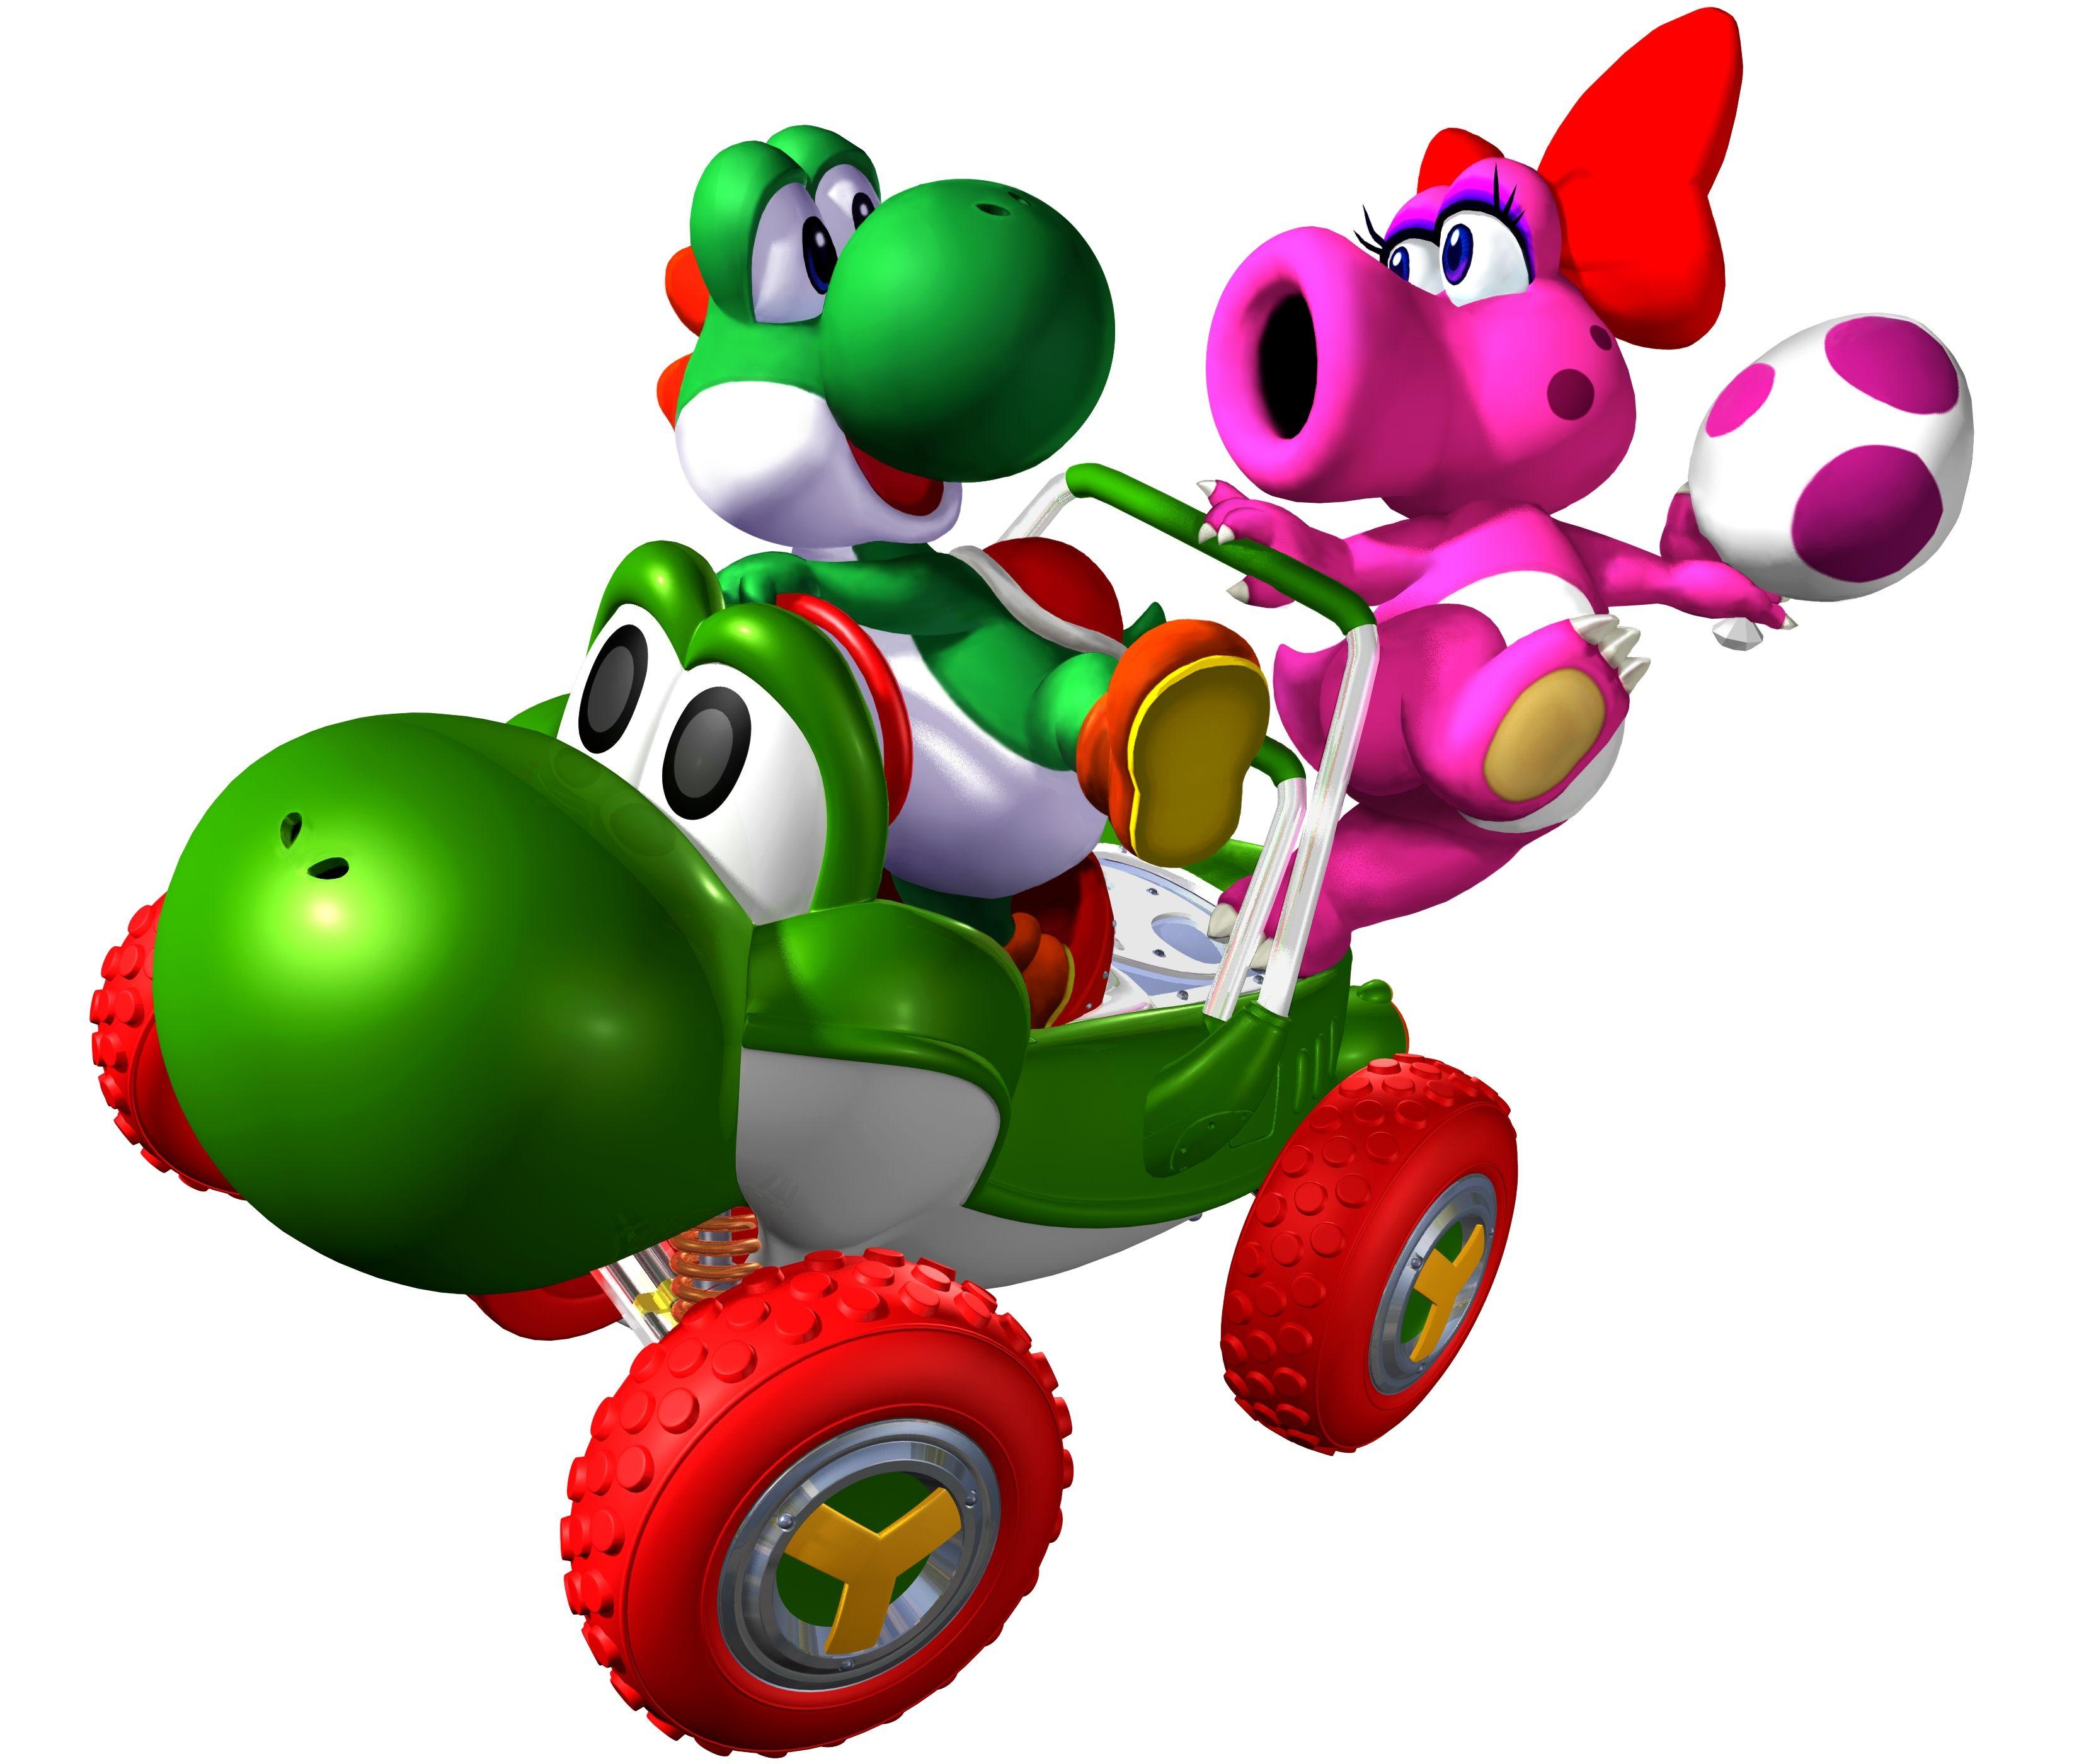 Epingle Par Heloise Sur Nate S Favorite Stuff Mario Et Luigi Mario Bros Luigi